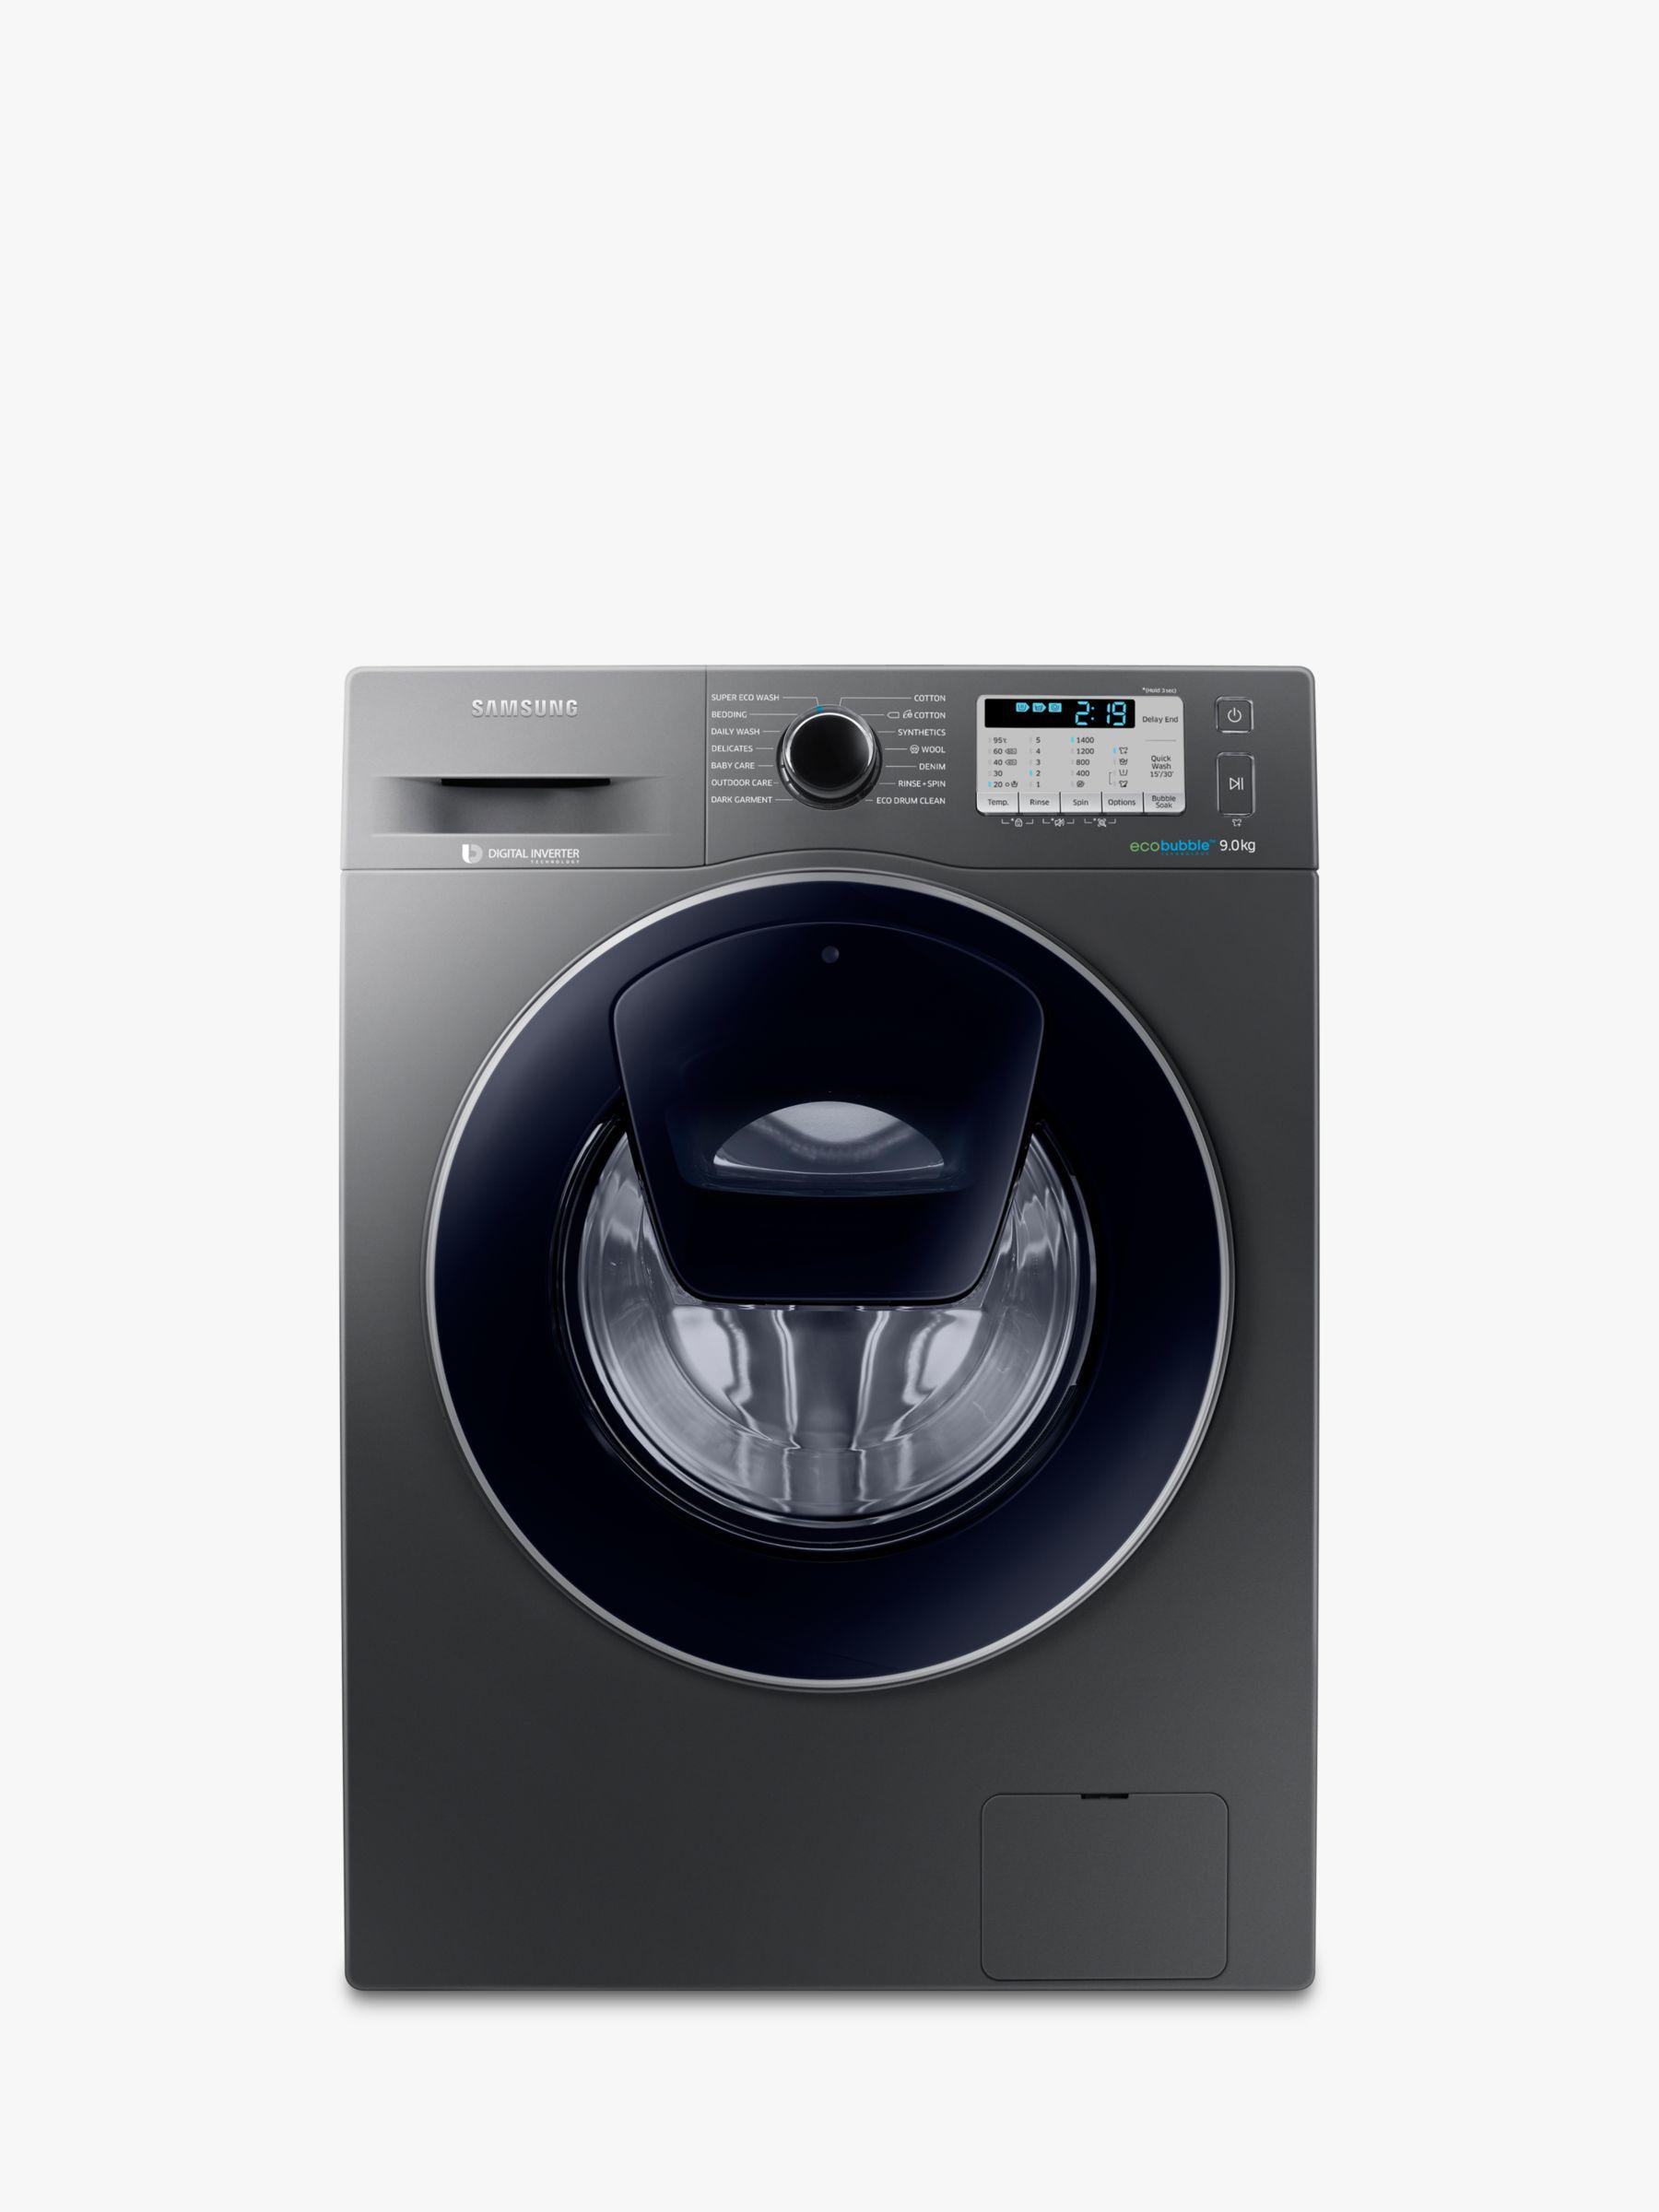 Samsung Samsung AddWash WW90K5413UX/EU Washing Machine, 9kg Load, A+++ Energy Rating, 1400rpm Spin, Inox